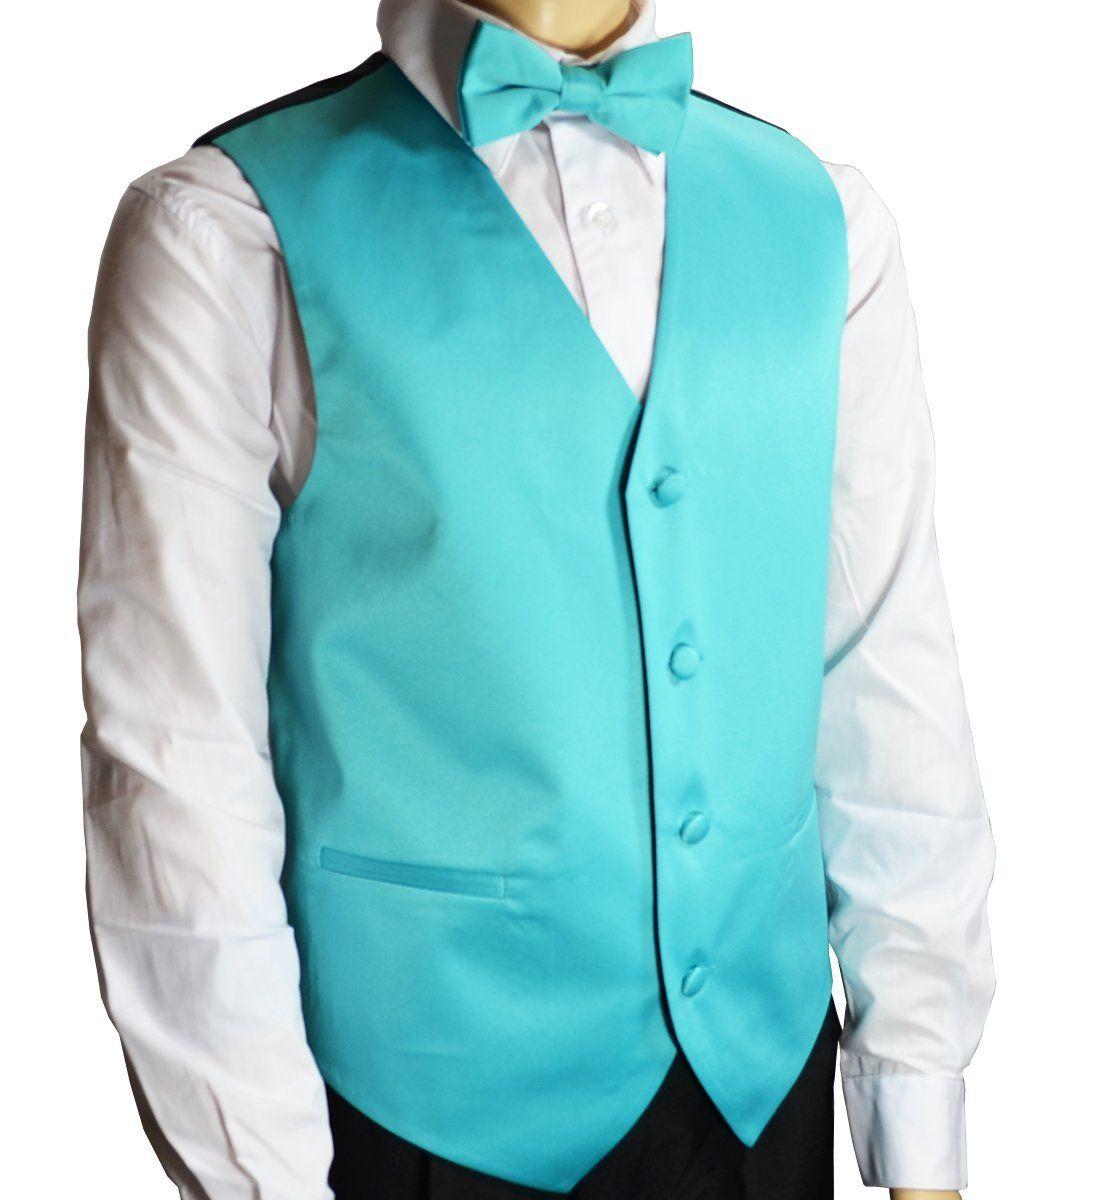 Solid Tiffany Blue Boys Tuxedo Vest Set | Products